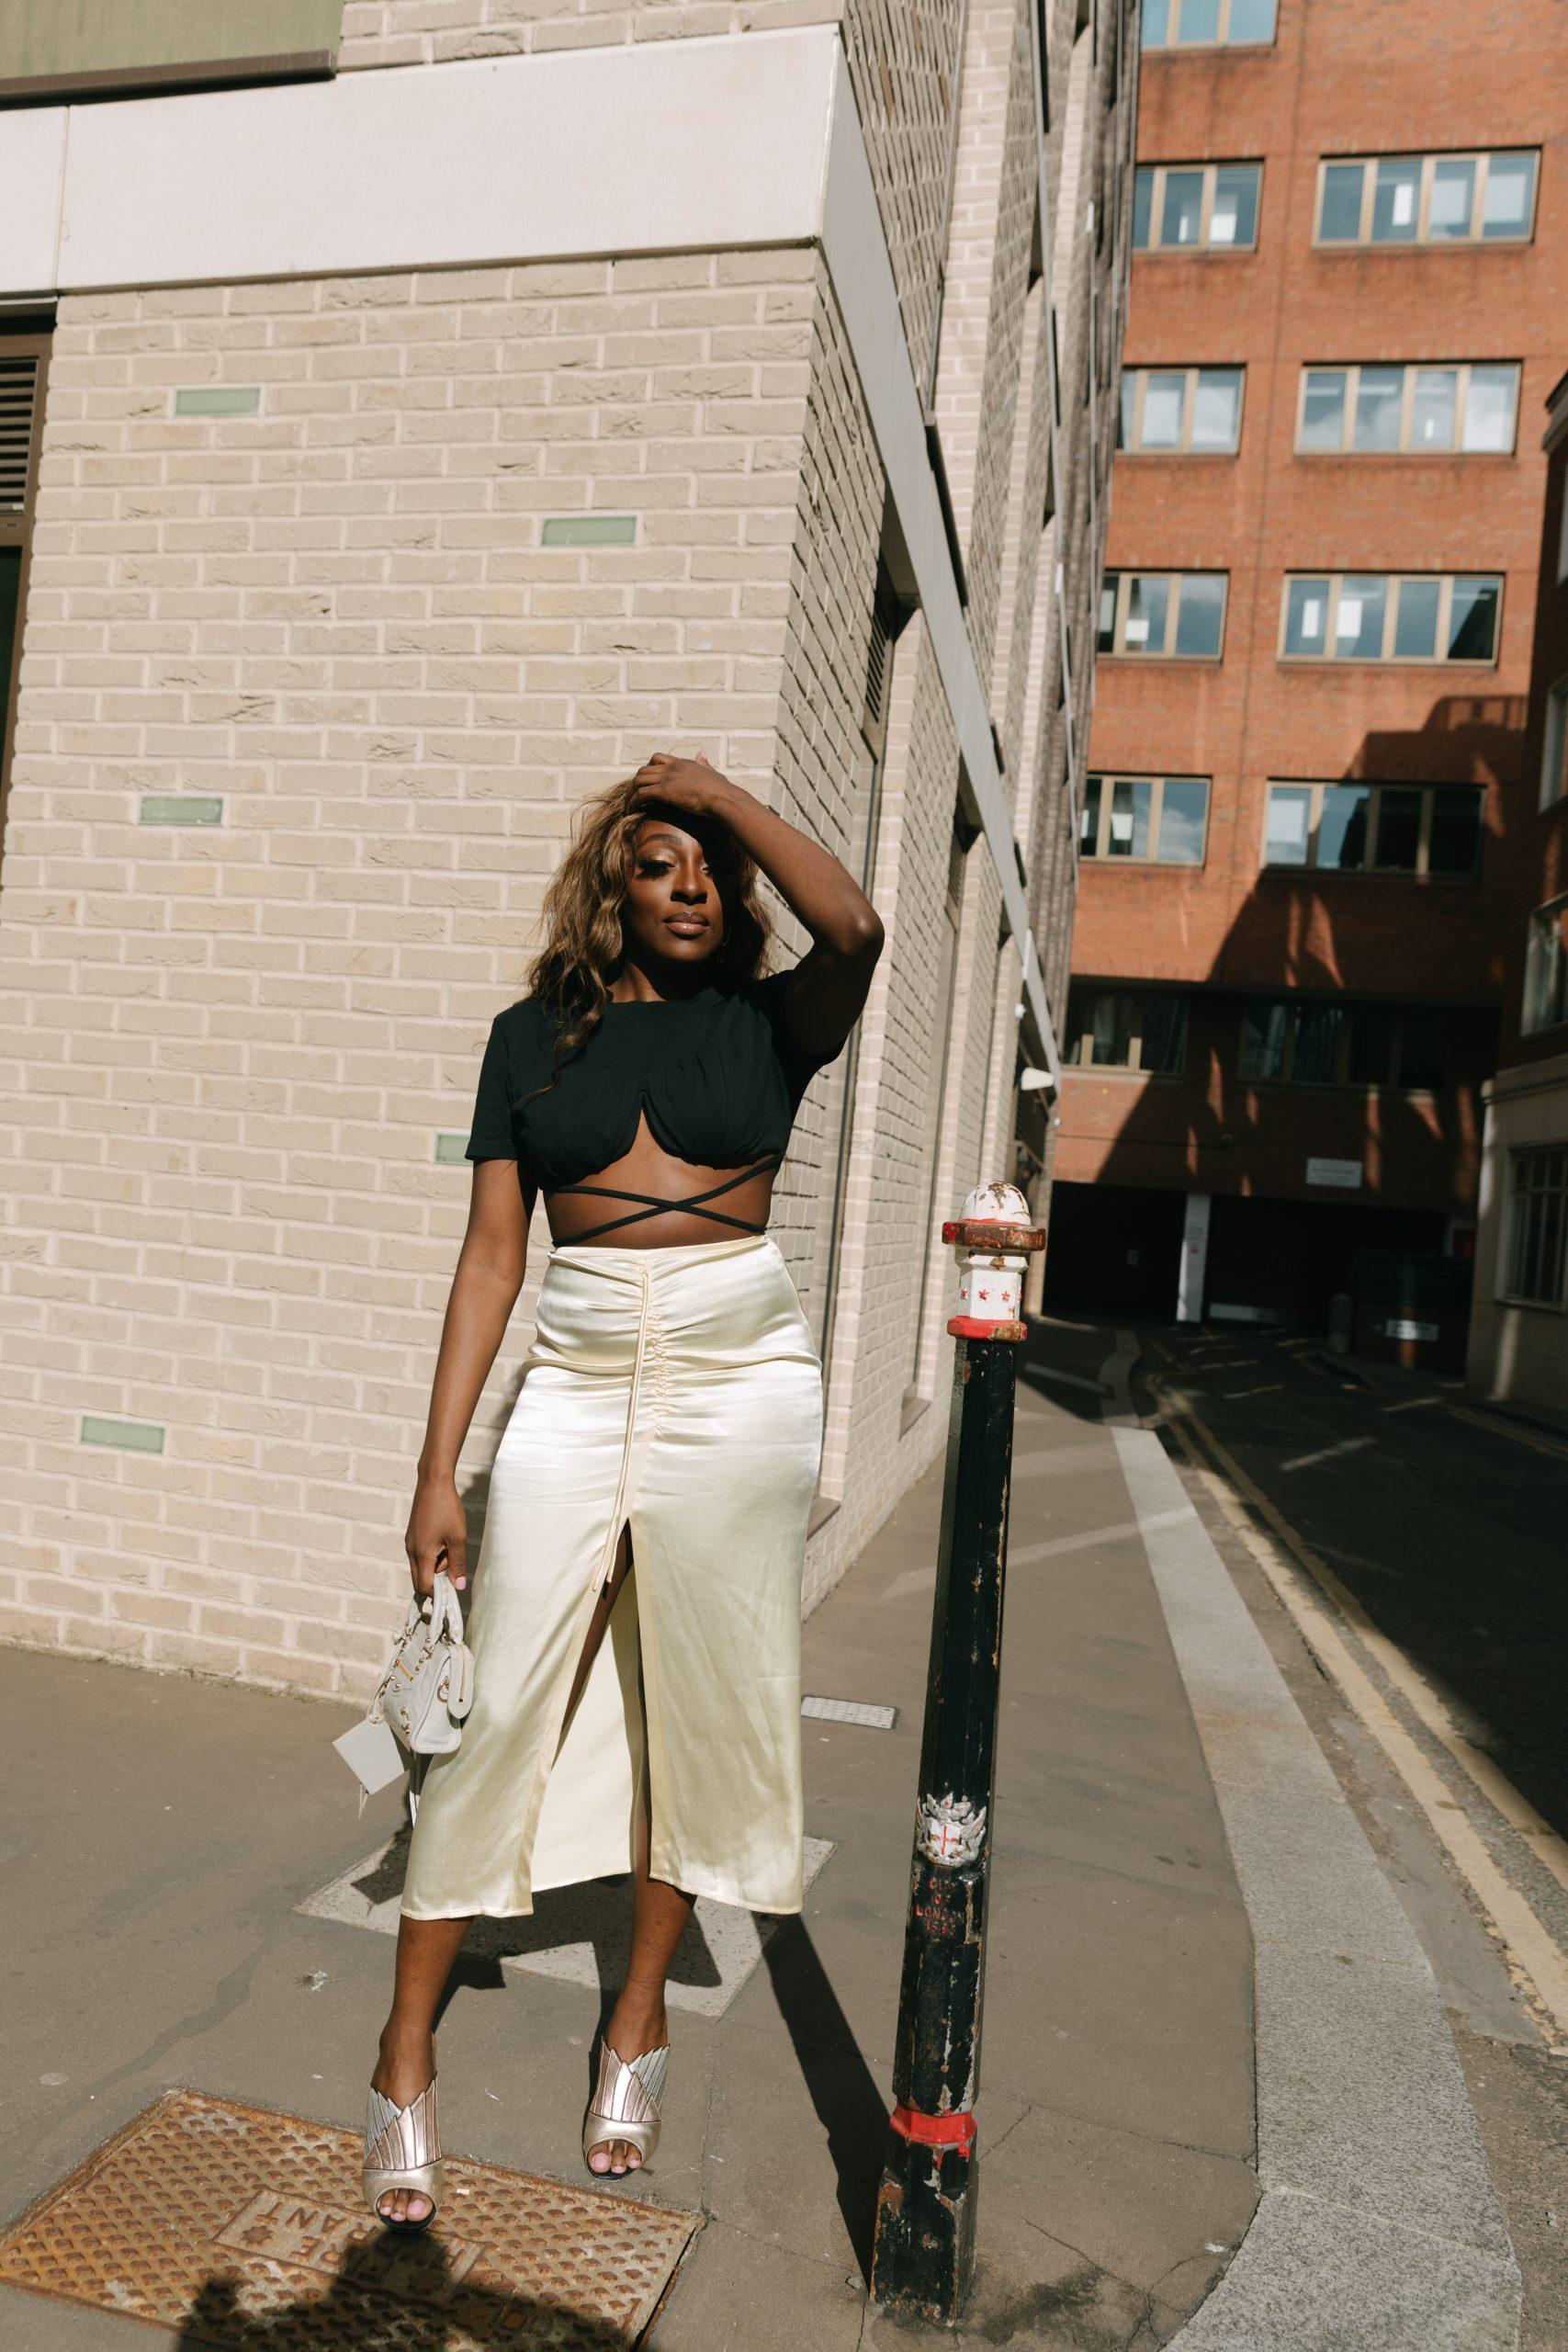 Jacquemus T-Shirt and Crop Top - Zara Satin midi skirt - Balenciaga mini city bag - Tasha Antwi